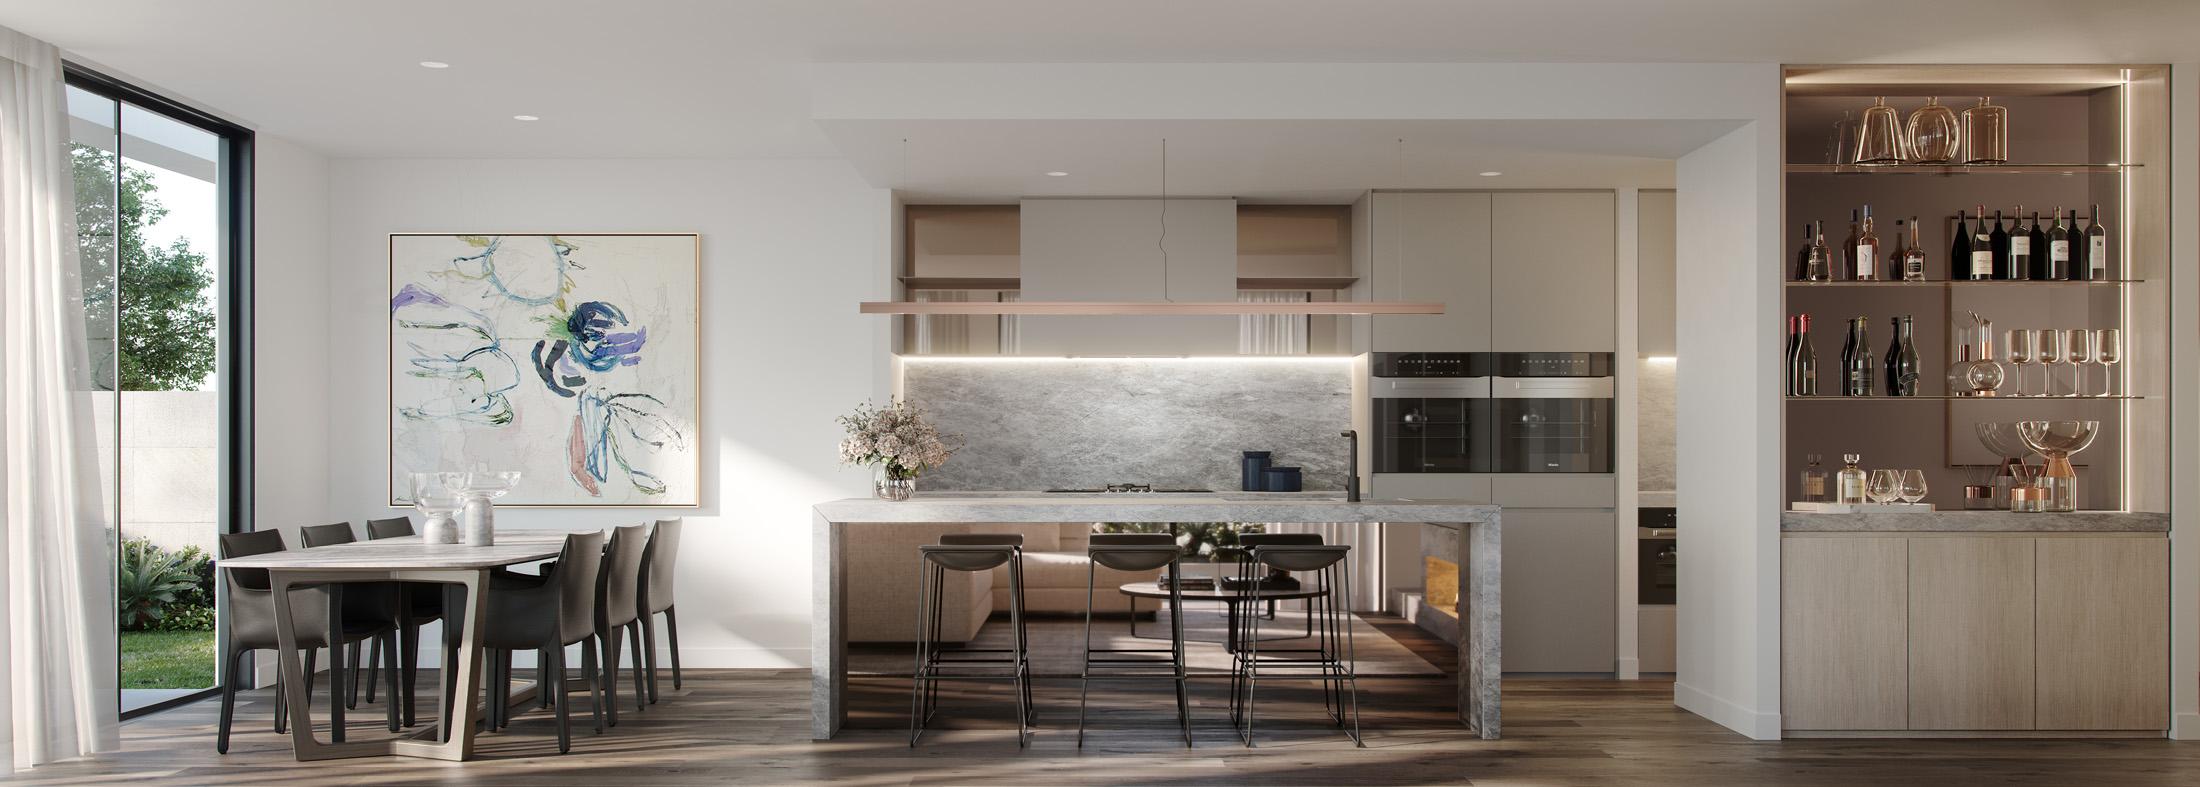 Trentham-House-kitchen-sandringham-Melbourne-3d-image-visualisation